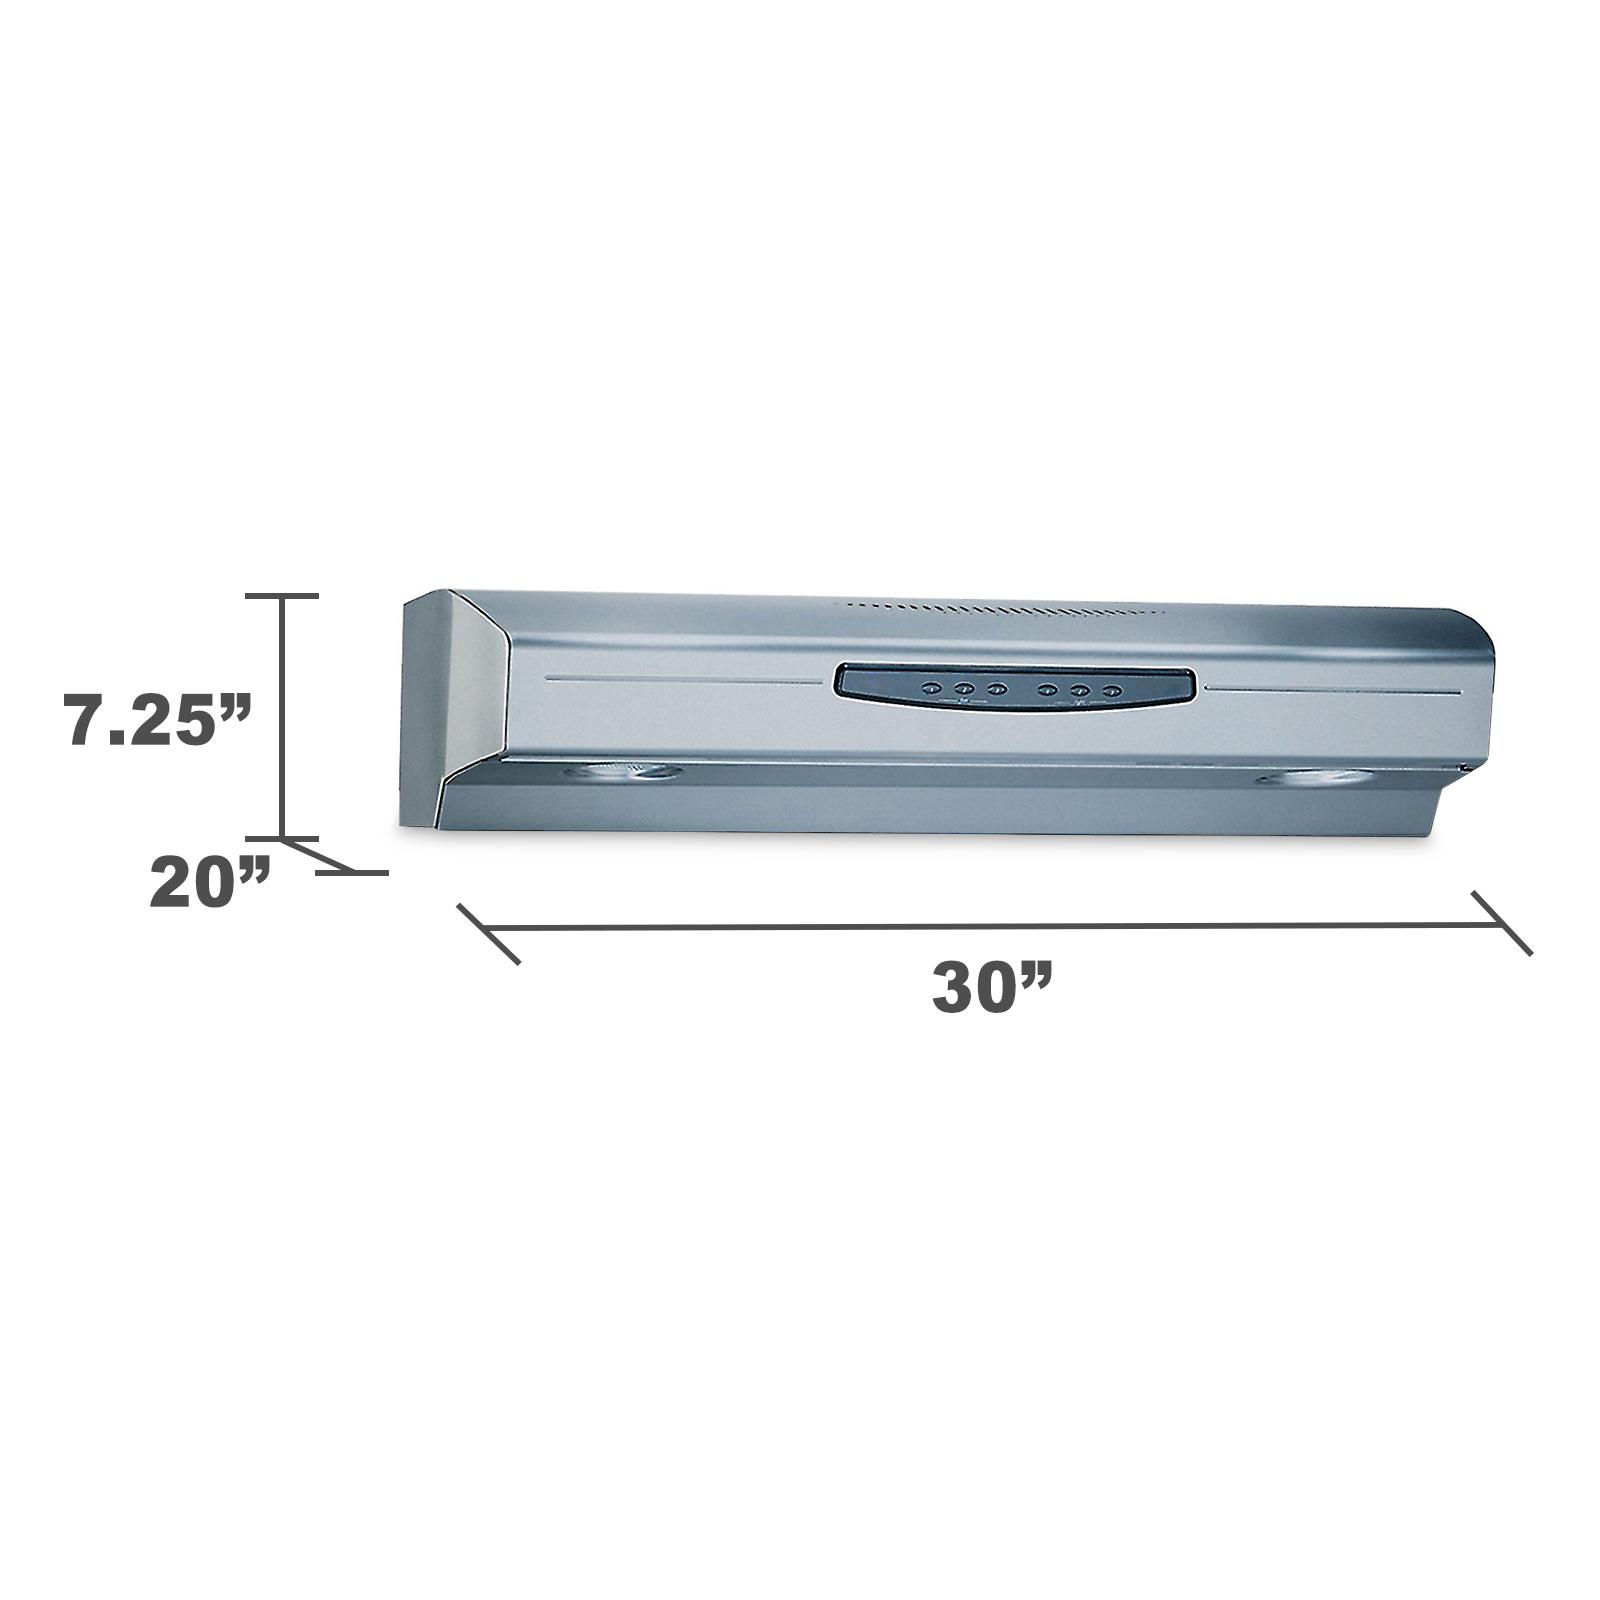 "Kenmore Elite 55023 30"" Updraft Range Hood with 3-Setting Halogen Lighting  5502"